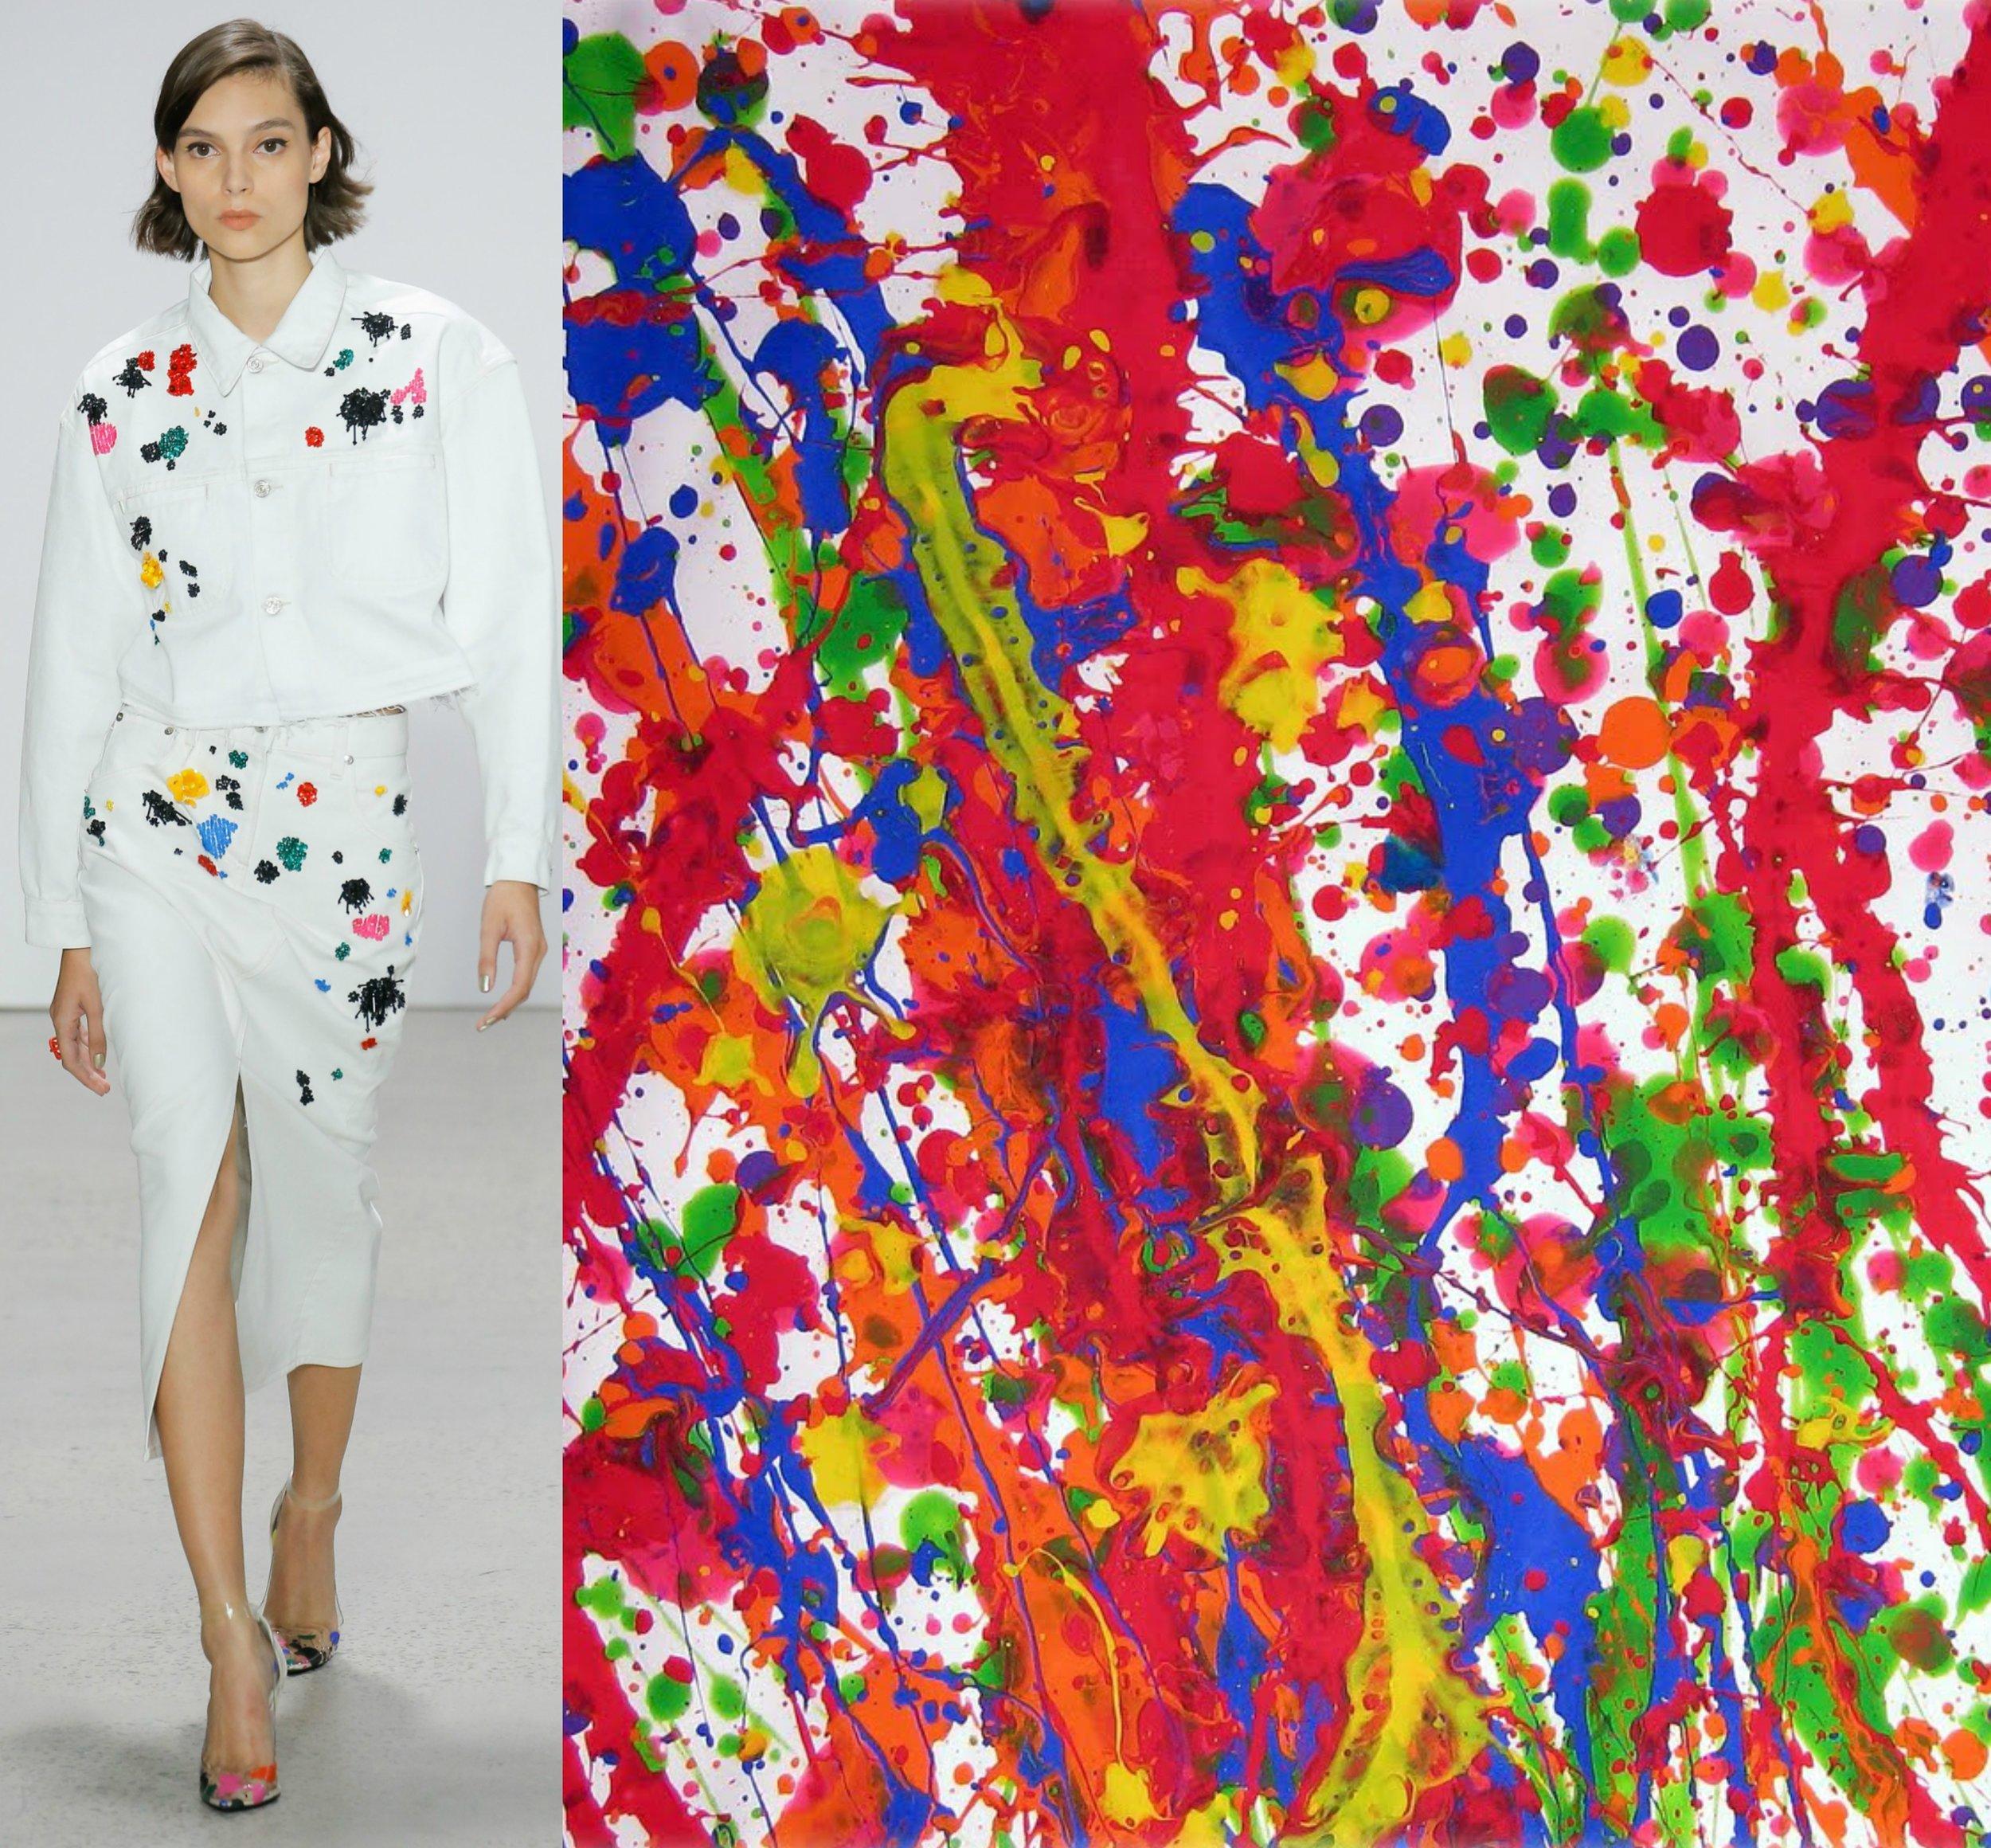 Oscar de la Renta - Jackson Pollock